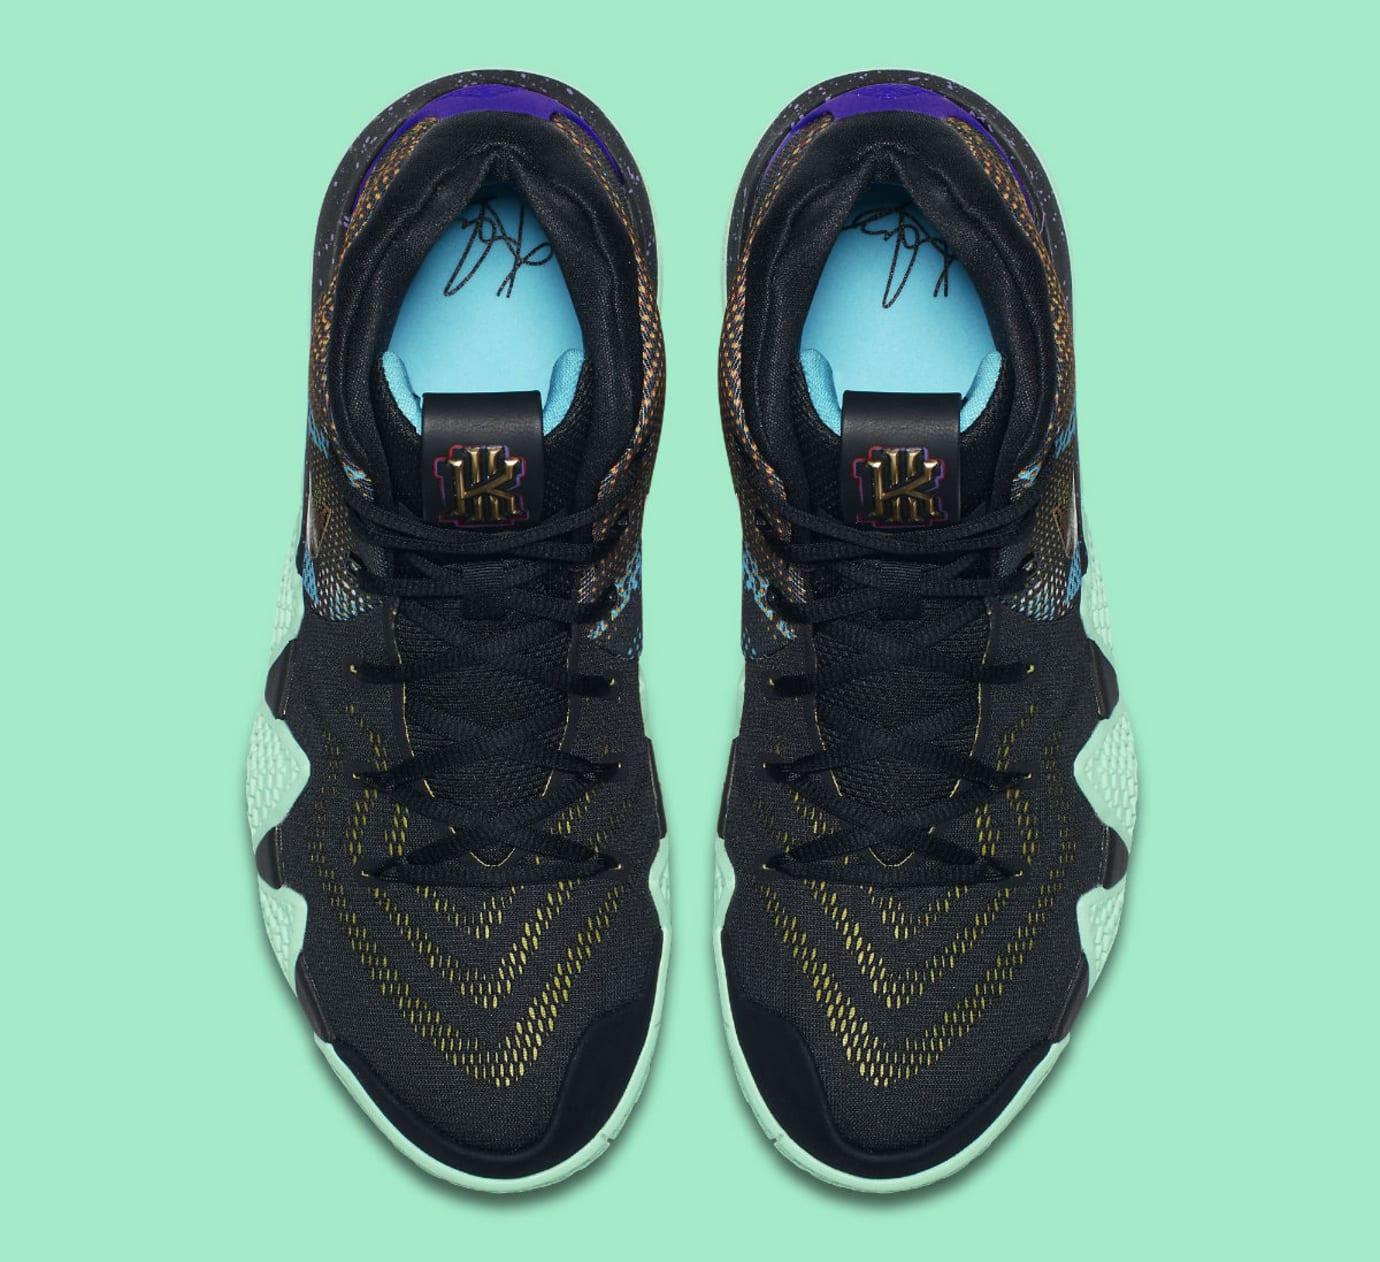 a9fa3b5dad80 Nike Kyrie 4 Mamba Mentality Release Date AV2597-001 Top